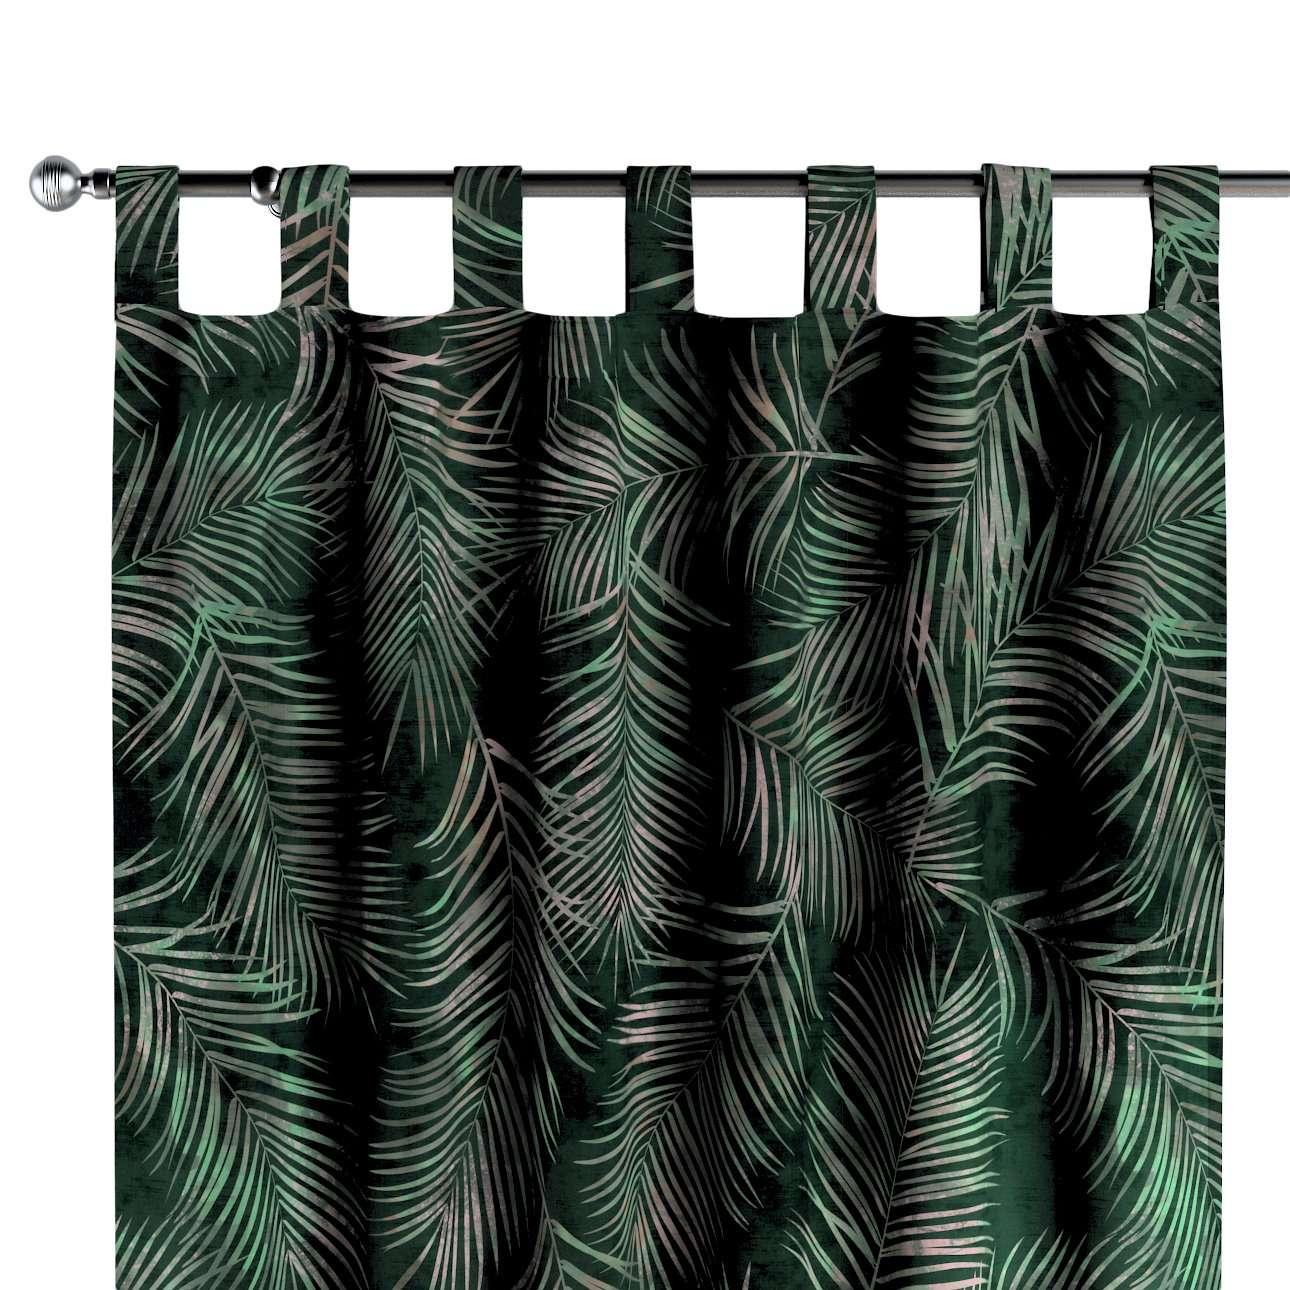 Zasłona na szelkach 1 szt. w kolekcji Velvet, tkanina: 704-21